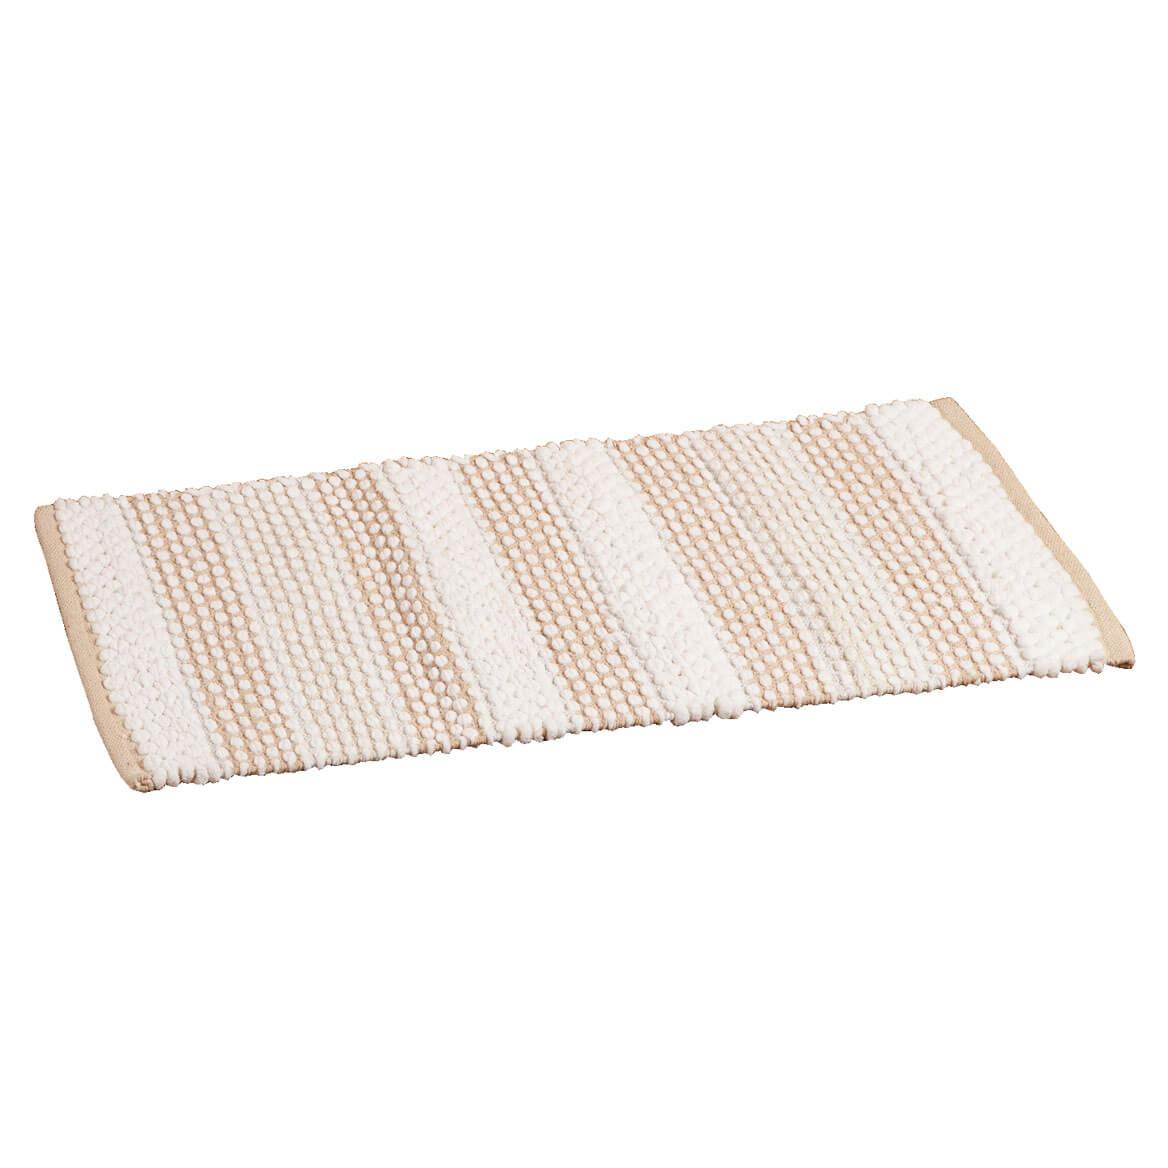 Plush Woven Microfiber Rug